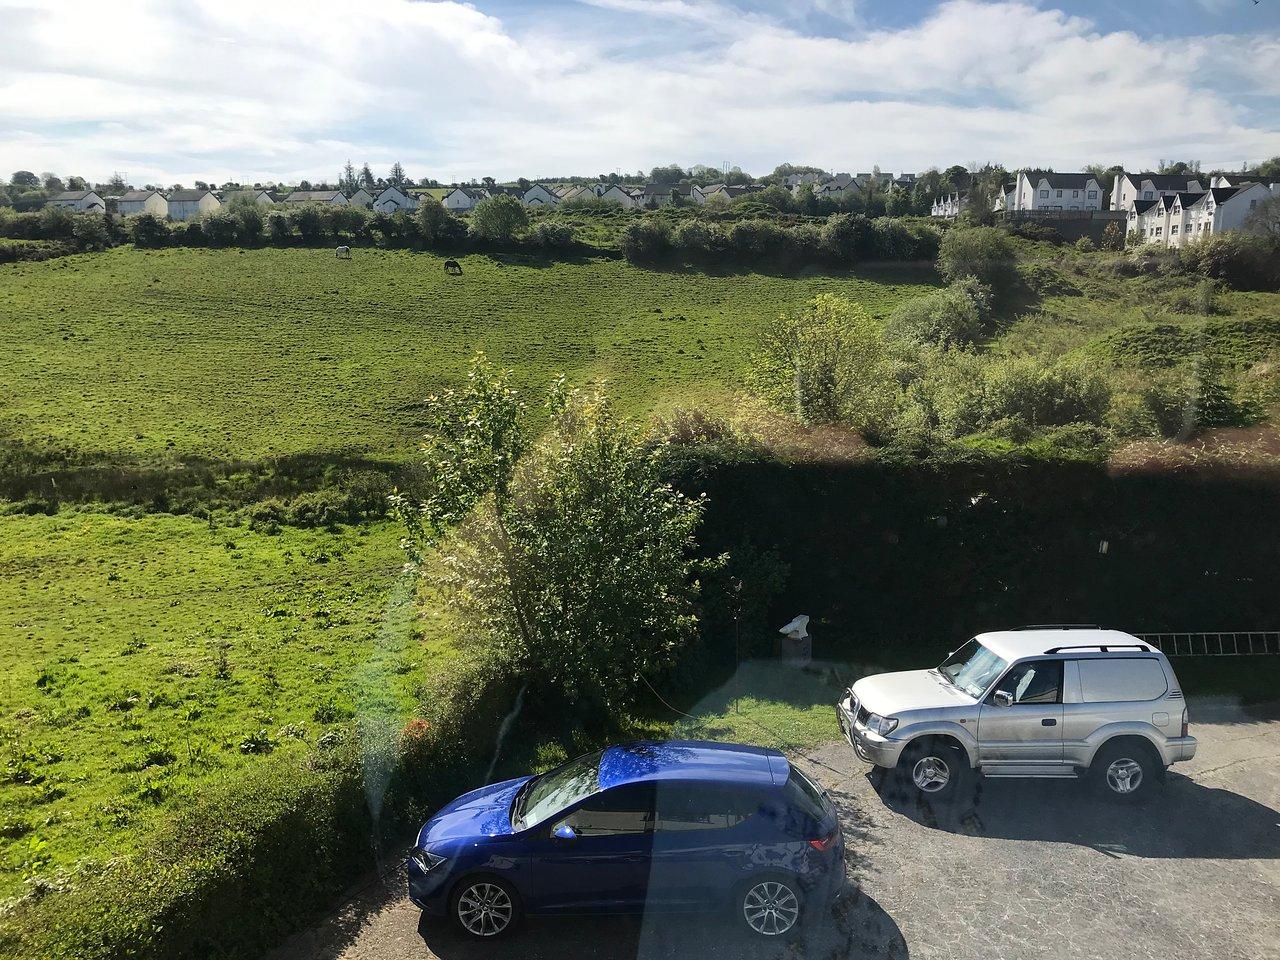 Letterkenny, Ireland Hobbies Events | Eventbrite